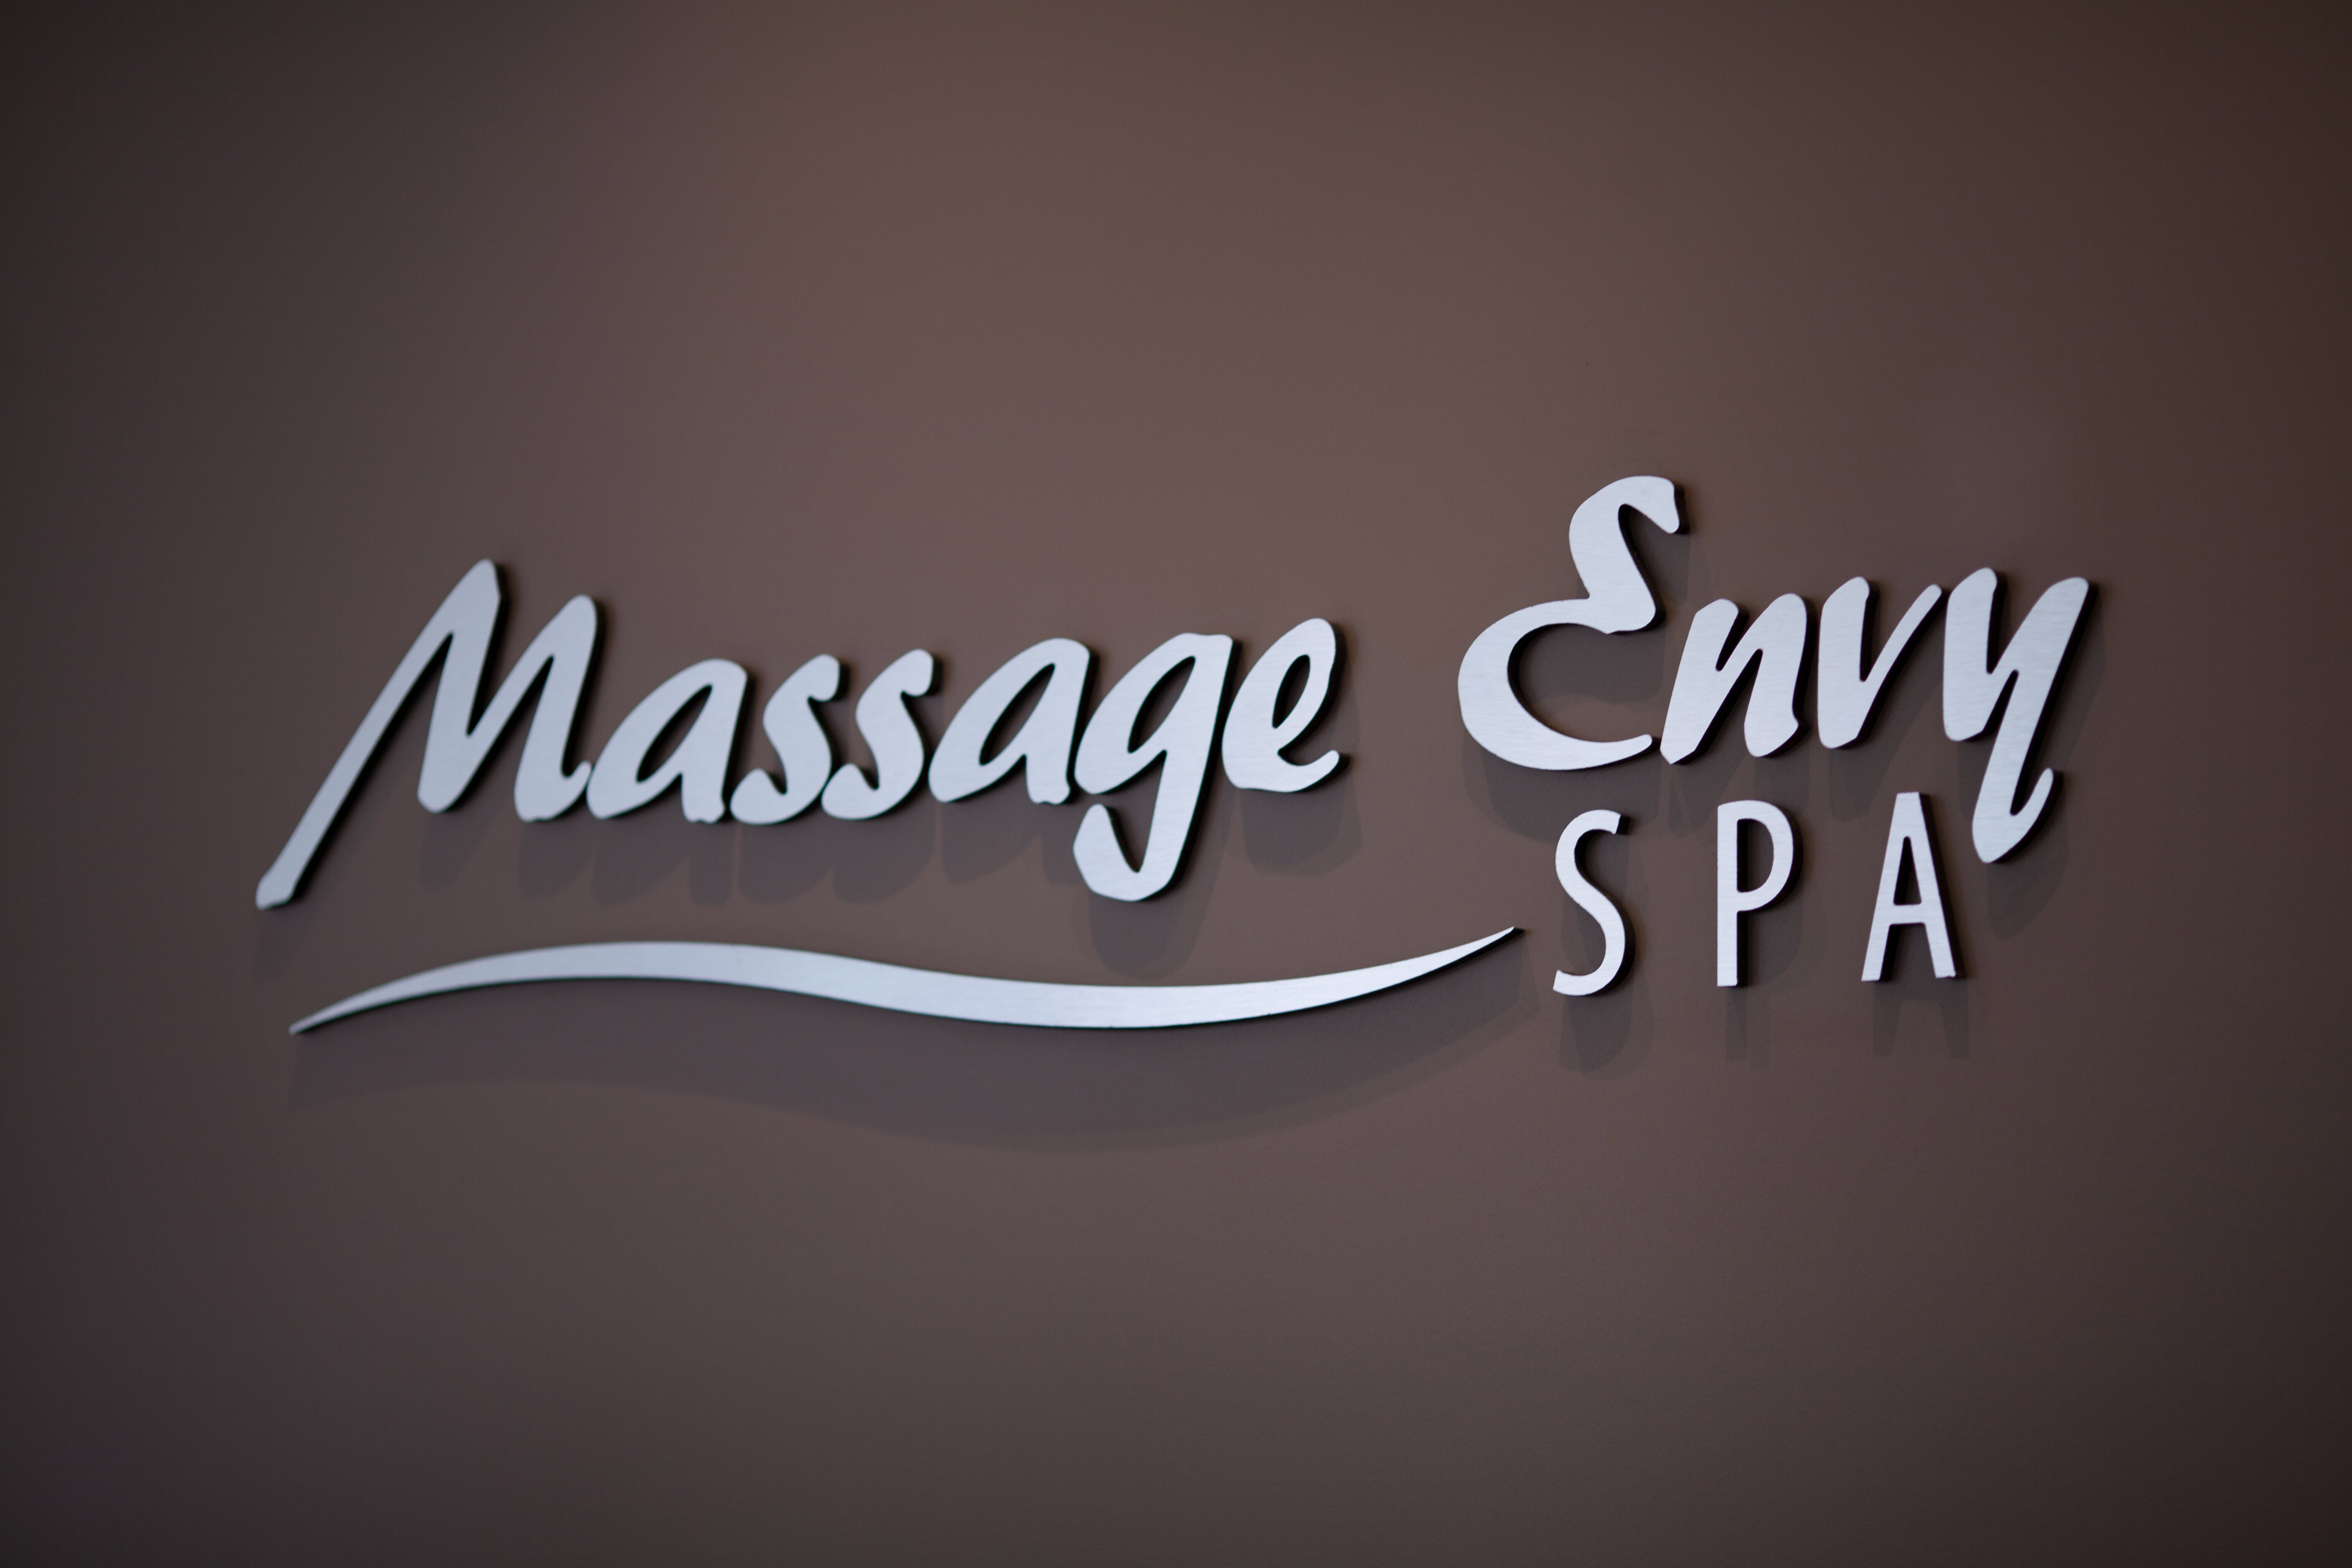 Massage Envy Spa - Mall 205